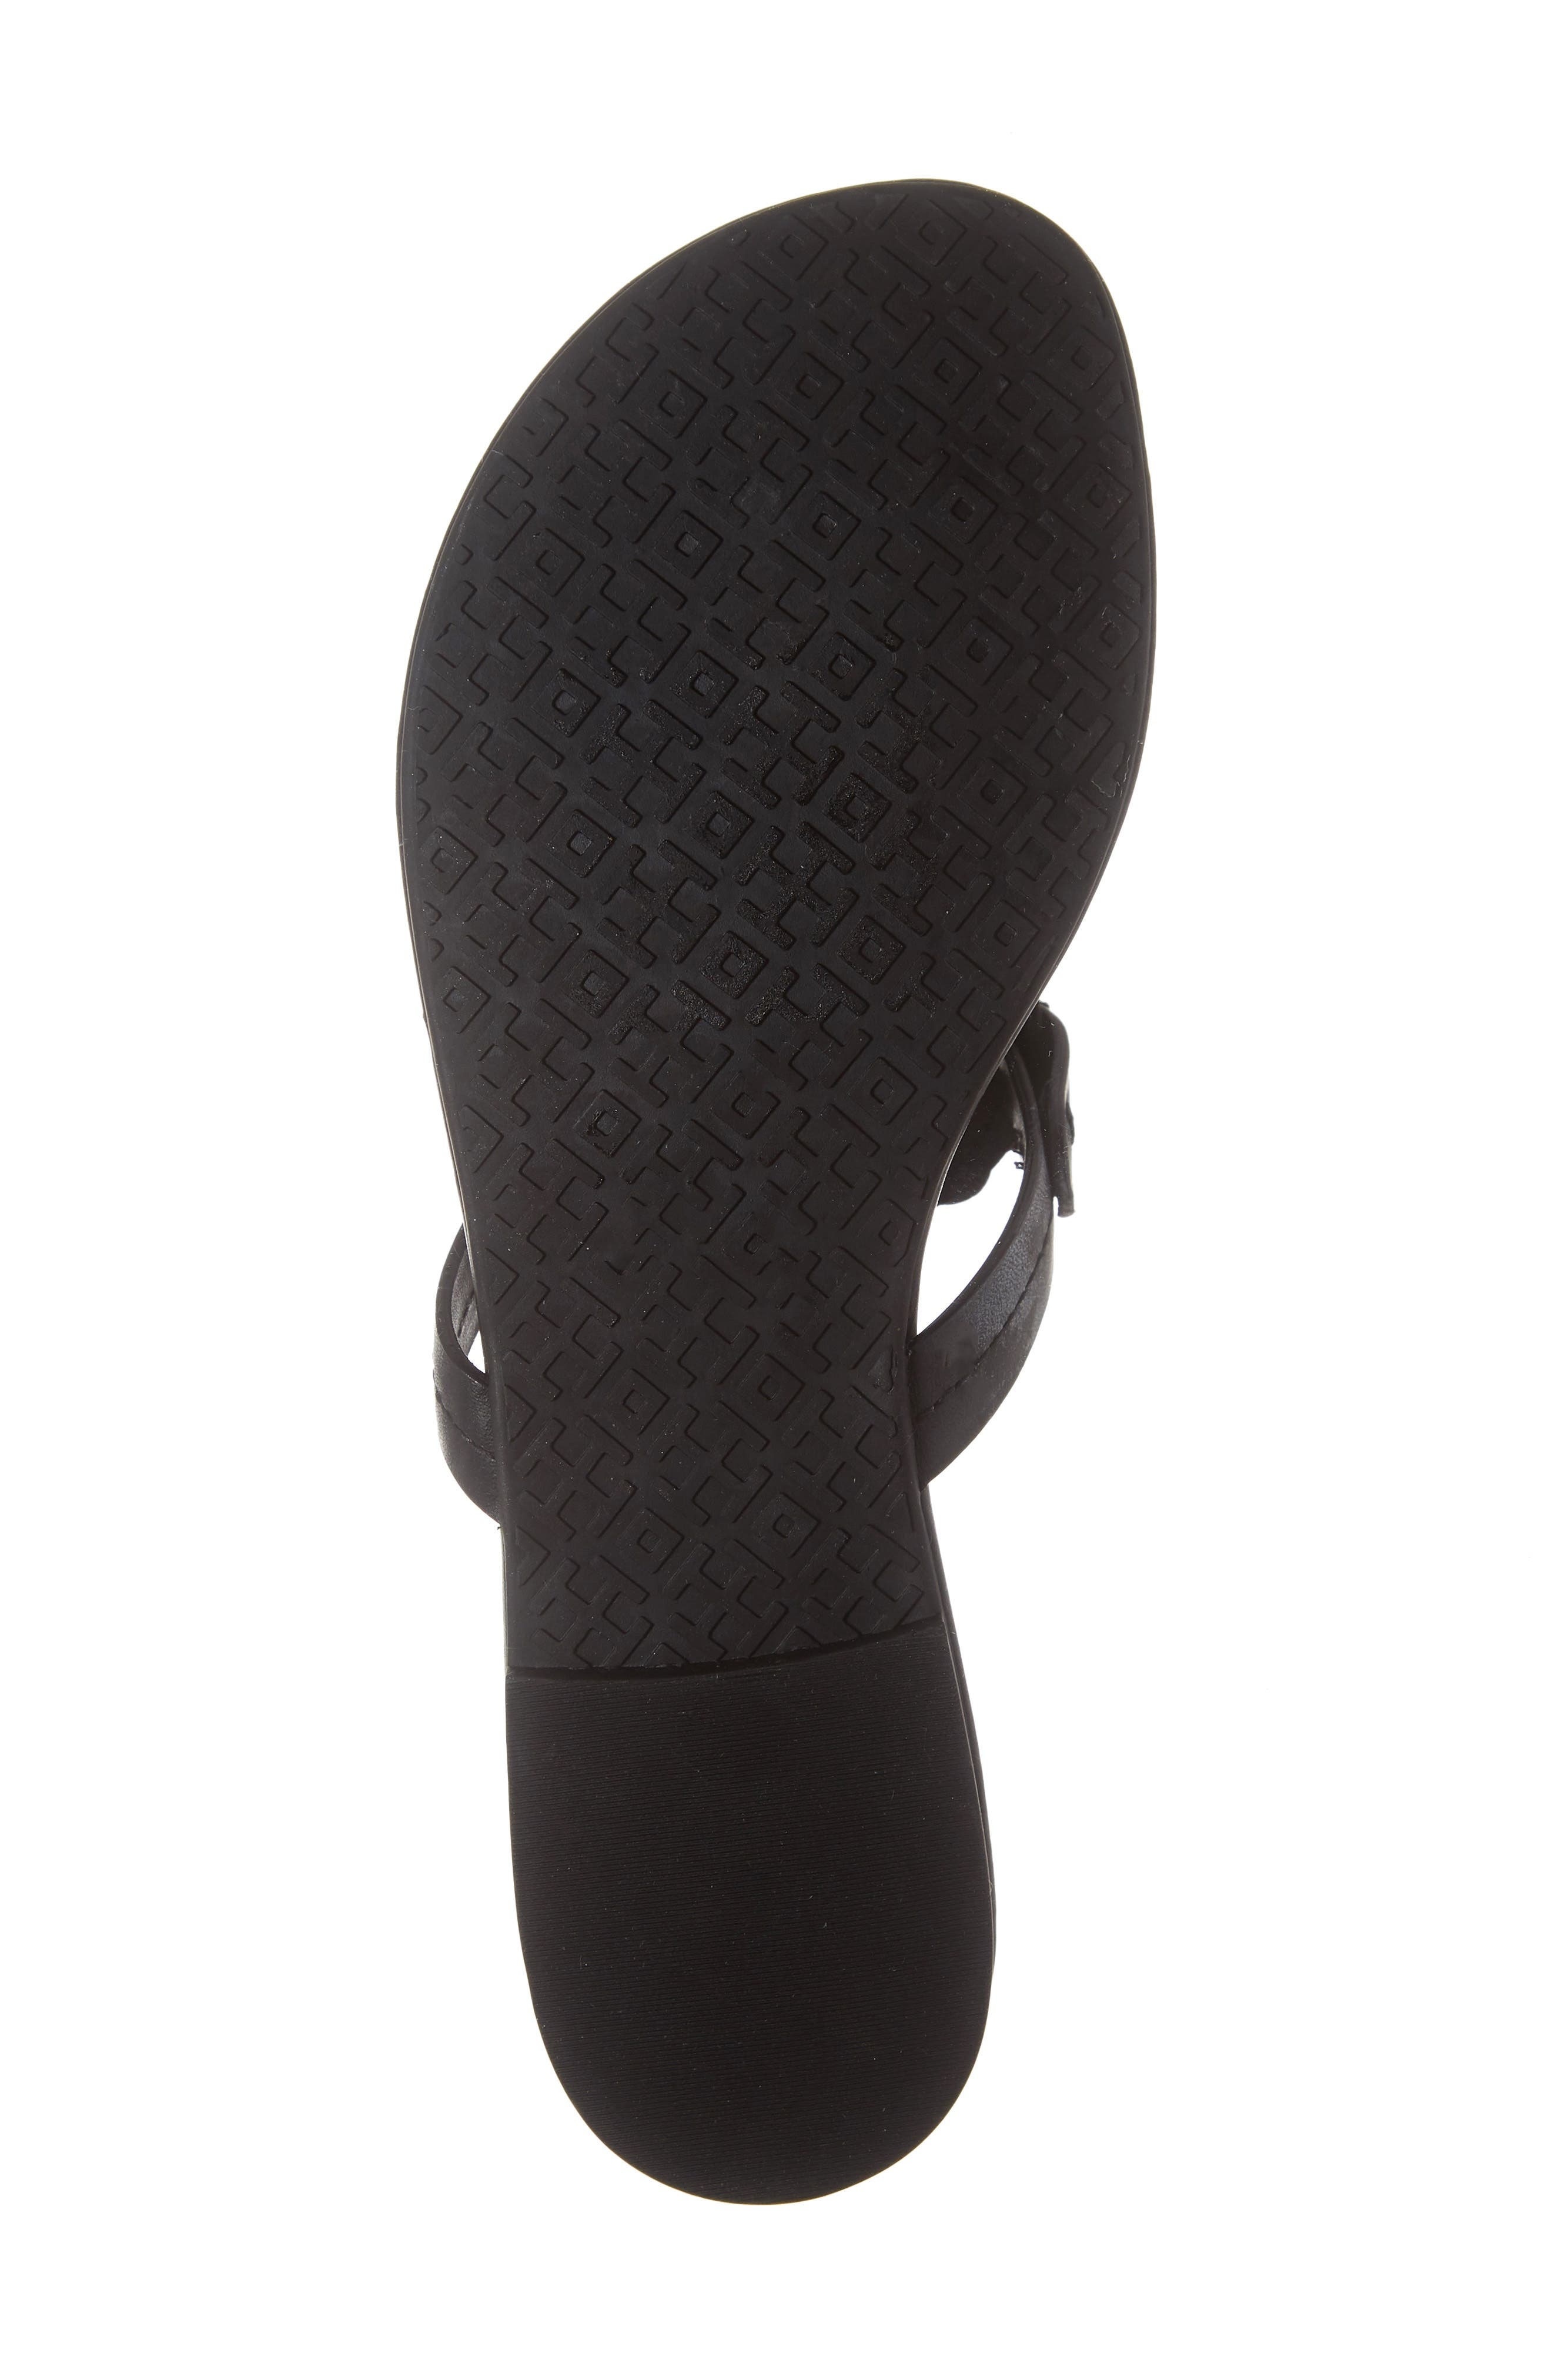 Miller Scalloped Medallion Sandal,                             Alternate thumbnail 6, color,                             PERFECT BLACK/ PERFECT NAVY